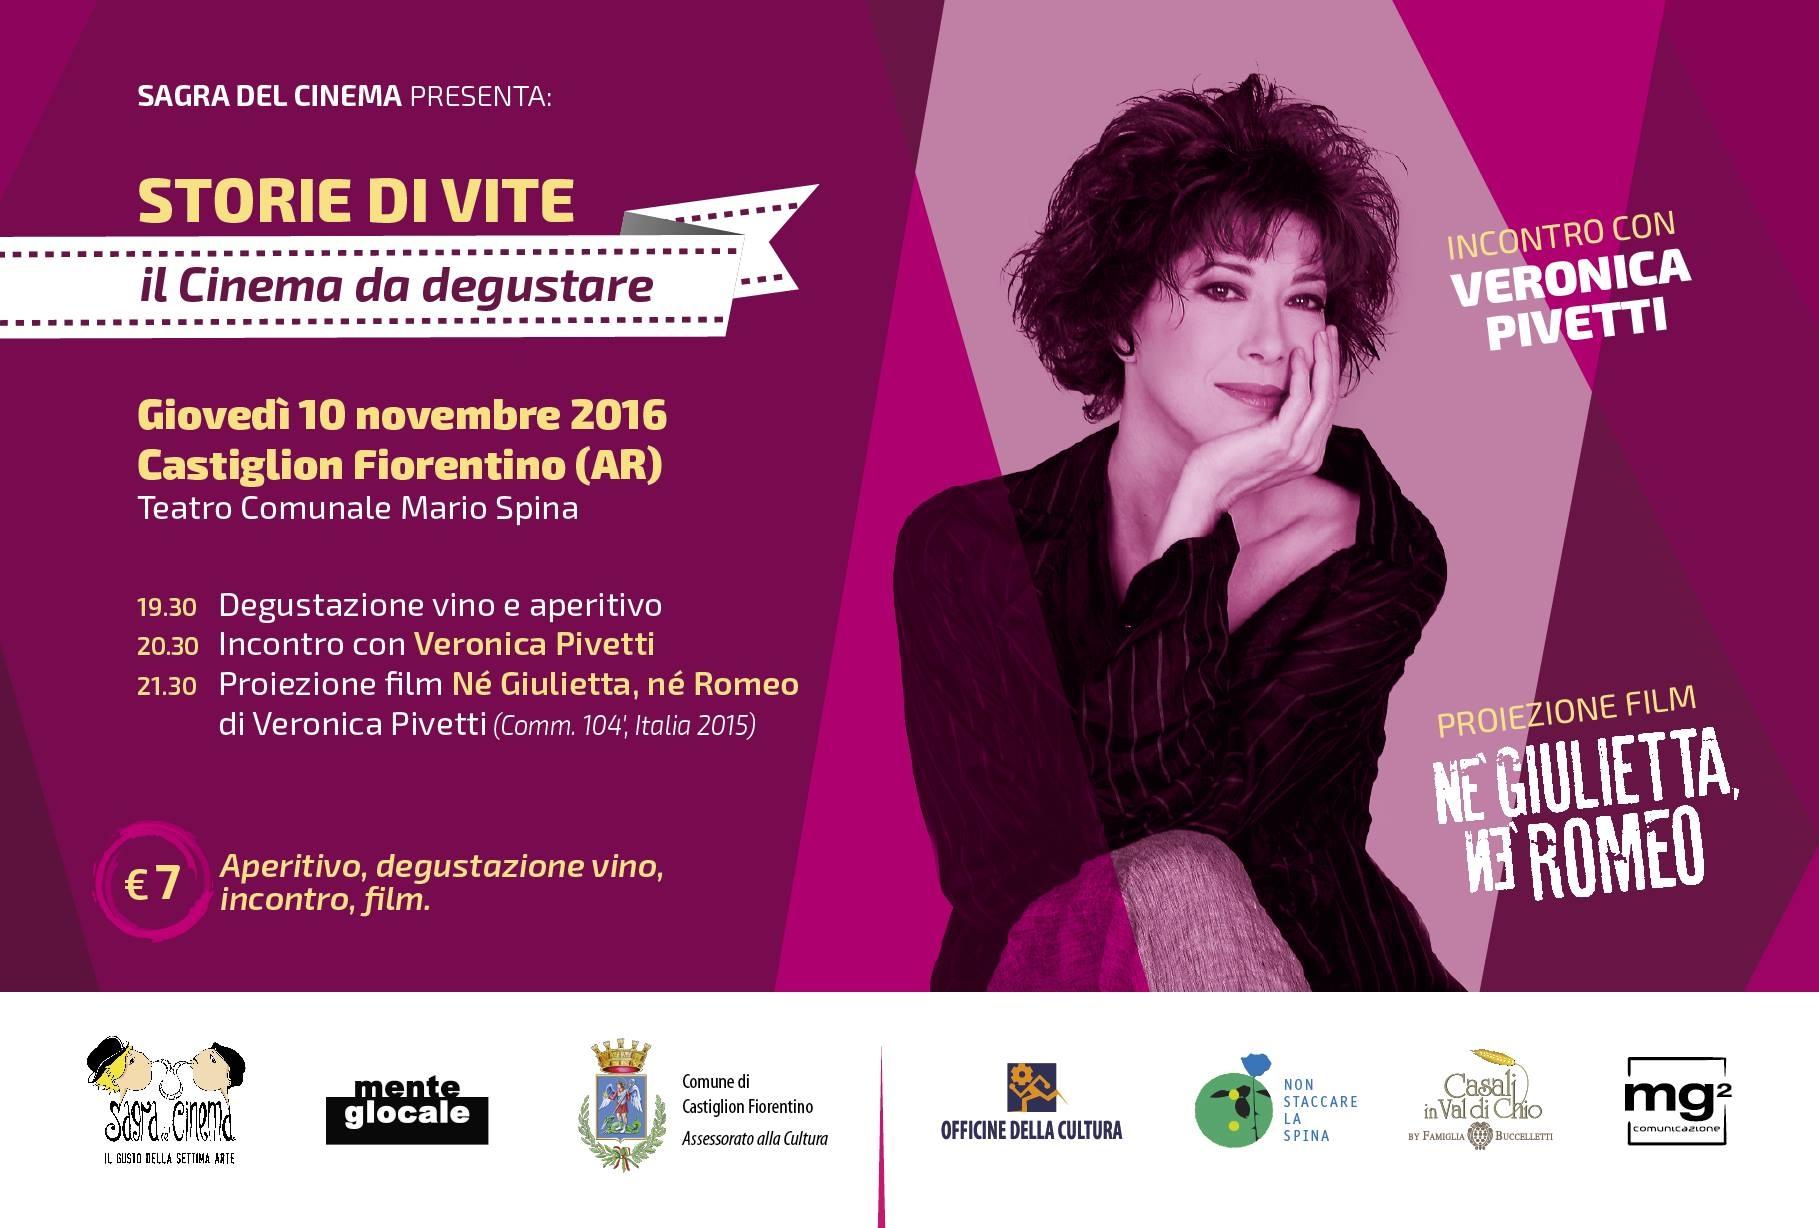 Sagra del cinema 'indoor', si parte con Veronica Pivetti